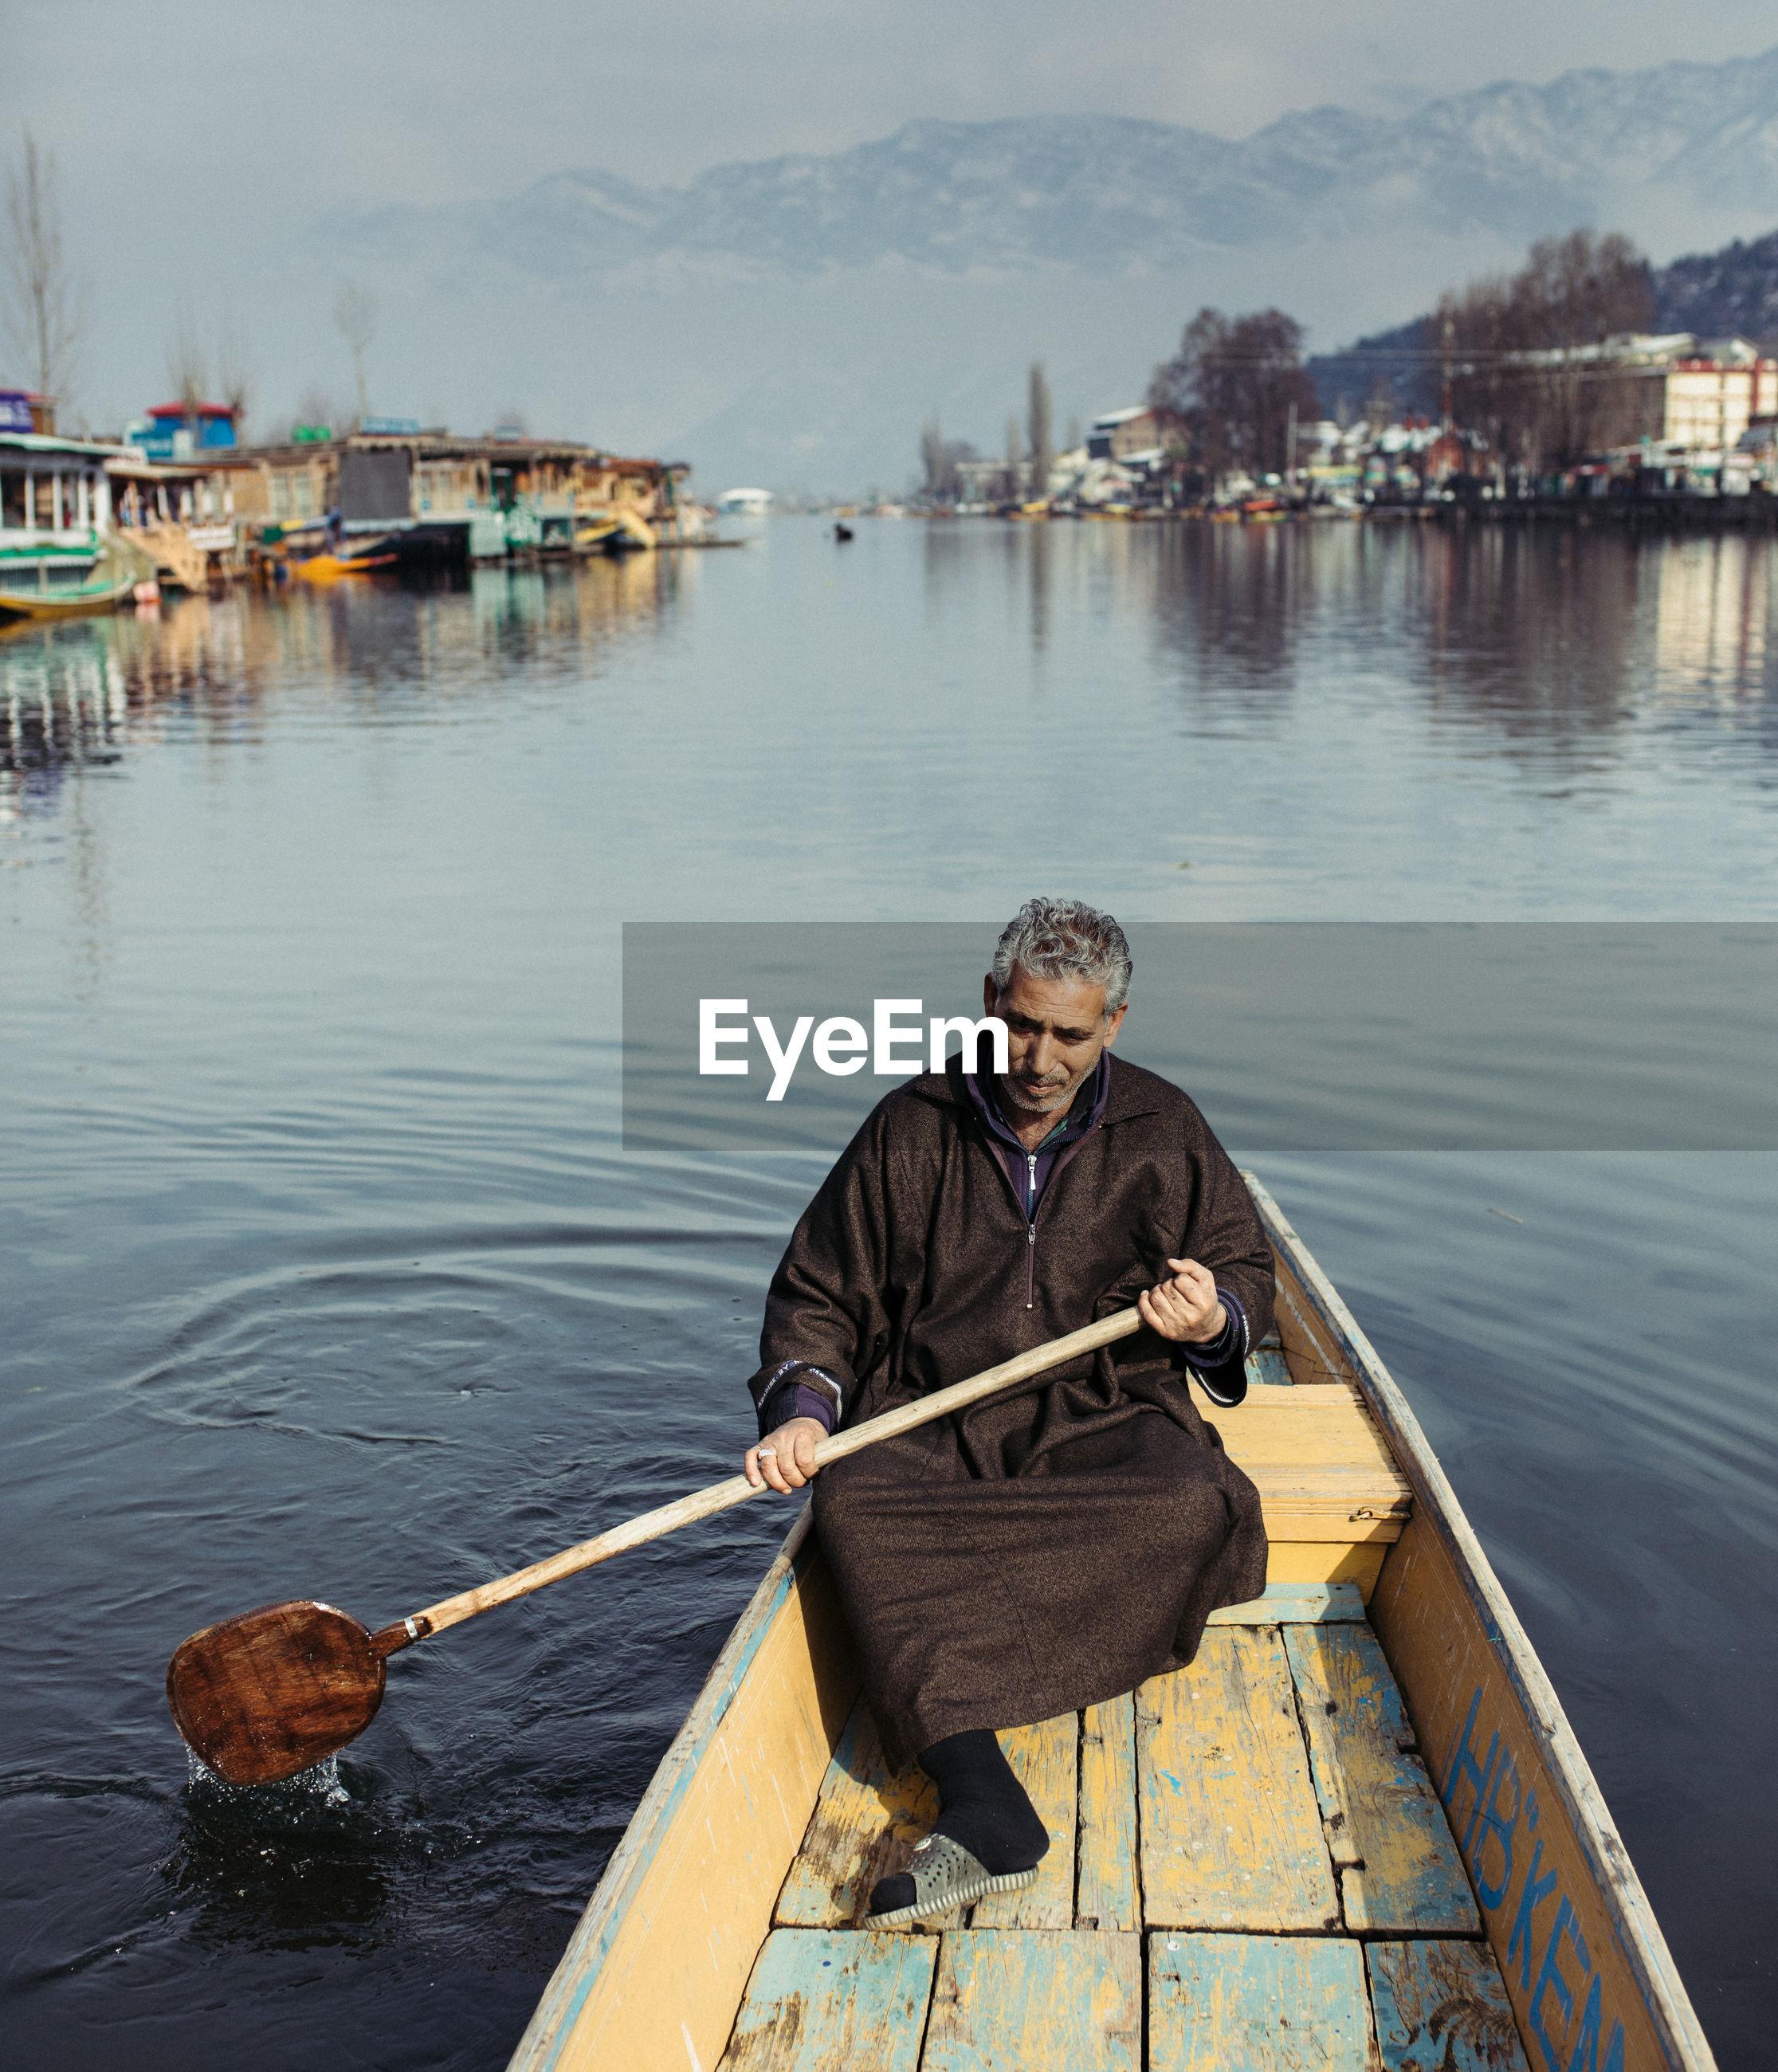 PORTRAIT OF MAN FISHING ON LAKE